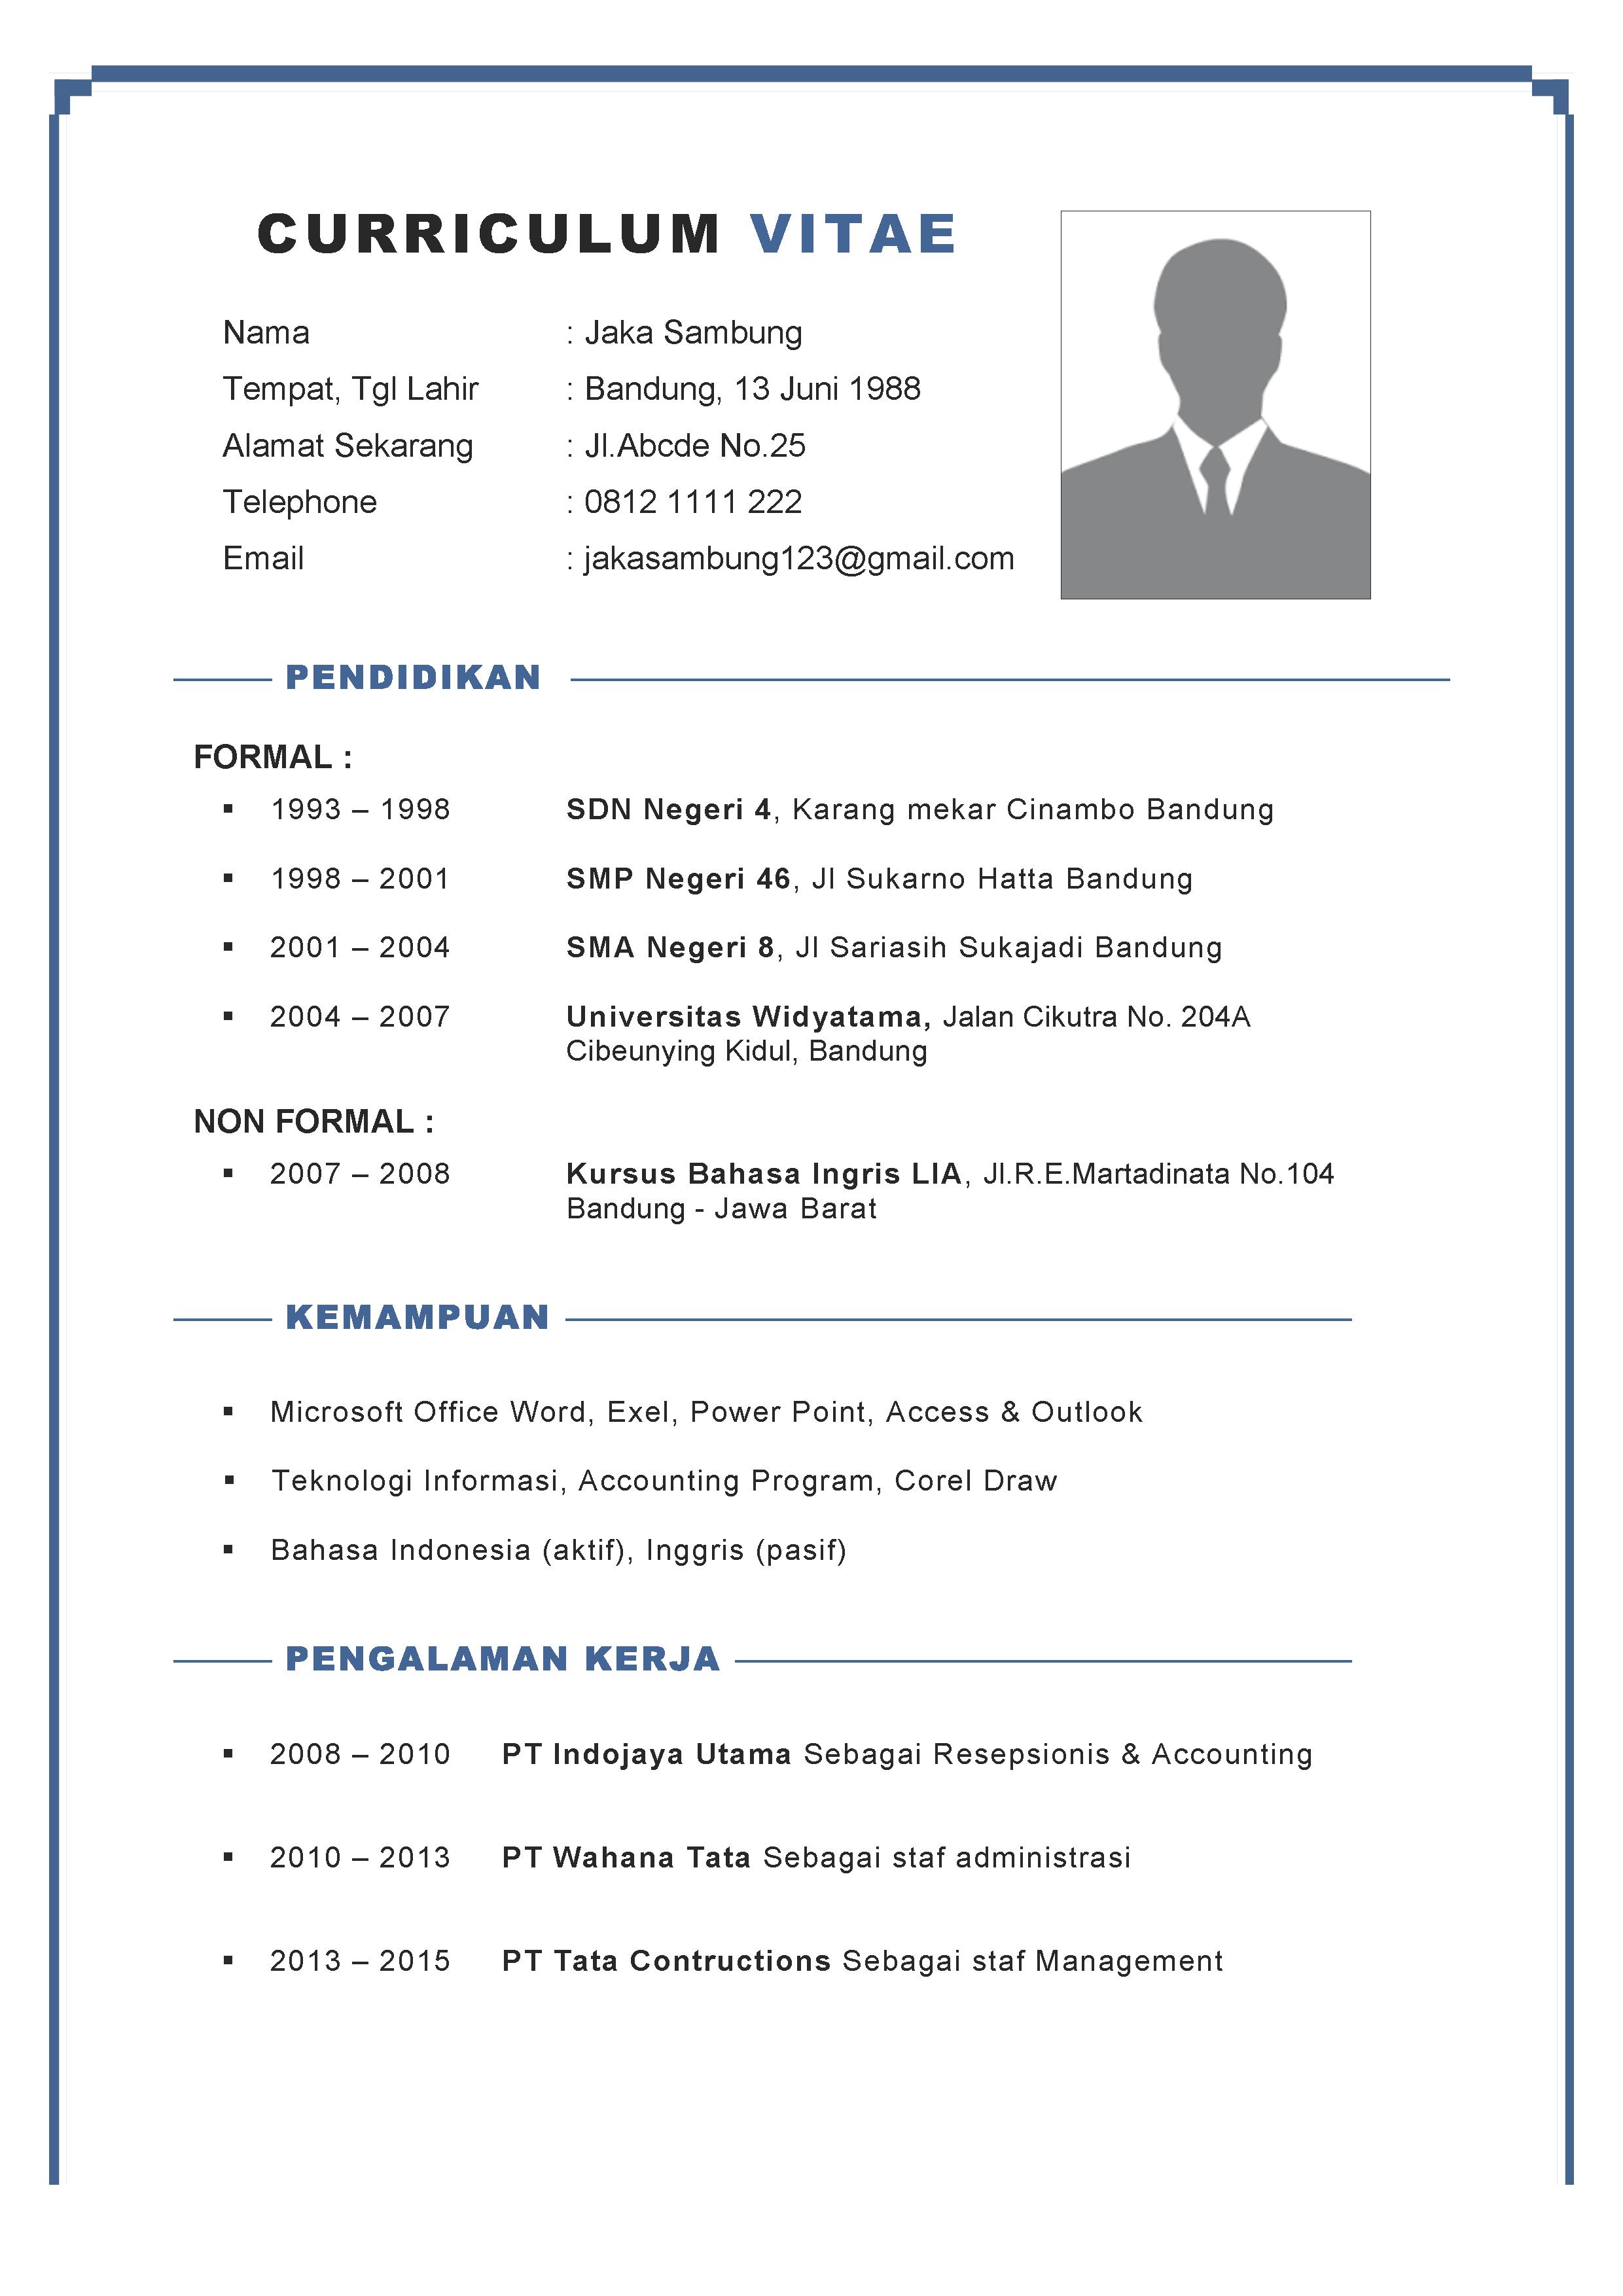 Contoh CV Formal